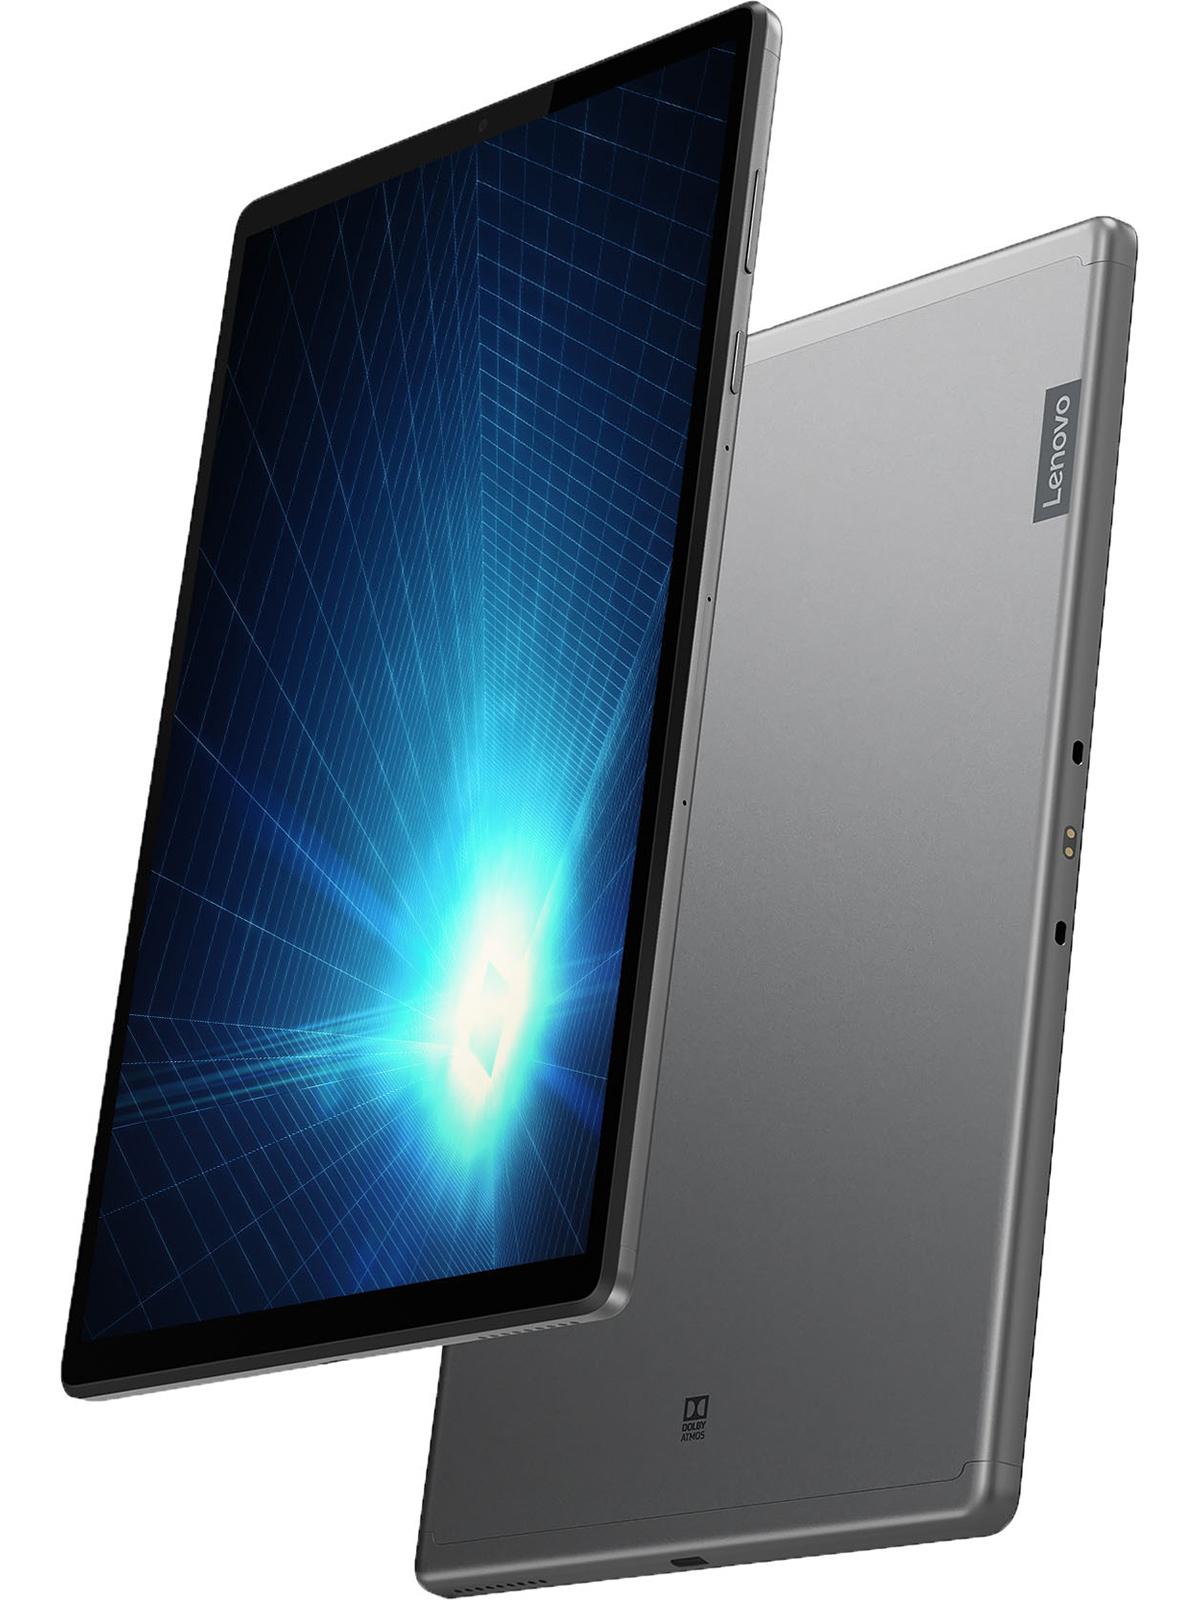 Lenovo Tab M10 Plus 10.3″ 64GB Tablet – Iron £140 at ElekDirect